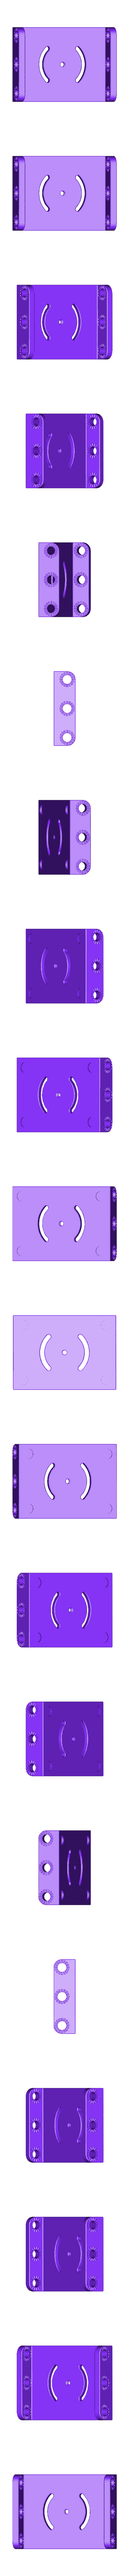 Base Plate v1.stl Télécharger fichier STL gratuit LiftPod - Support pliable multifonctionnel • Objet à imprimer en 3D, HeyVye